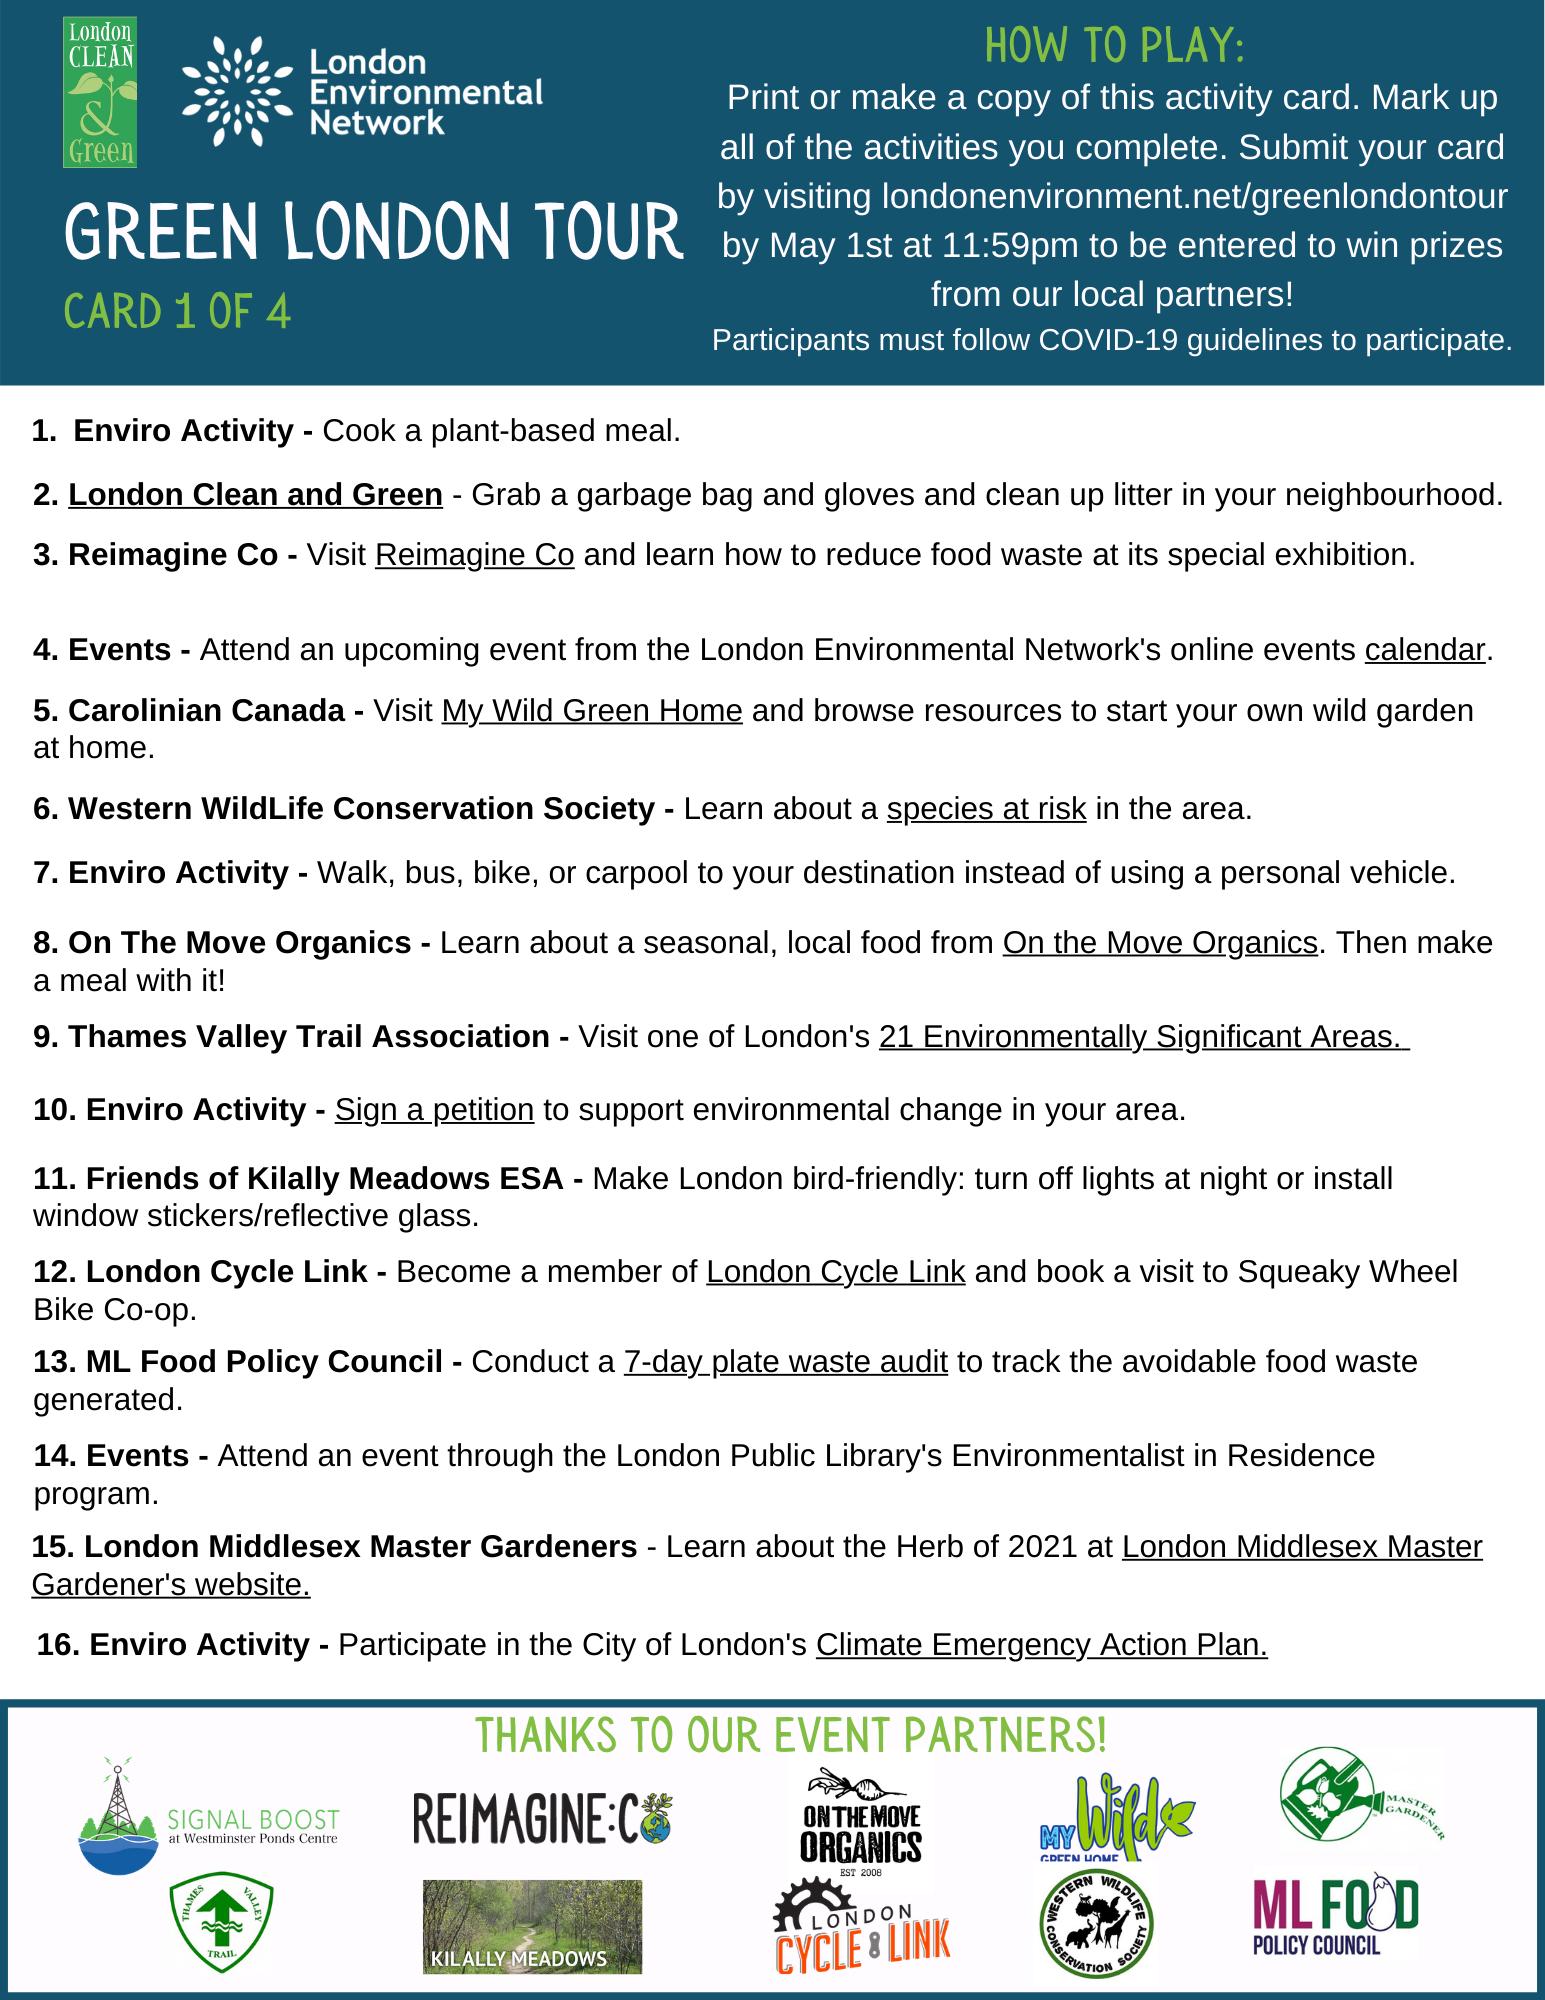 Green London Tour List 1